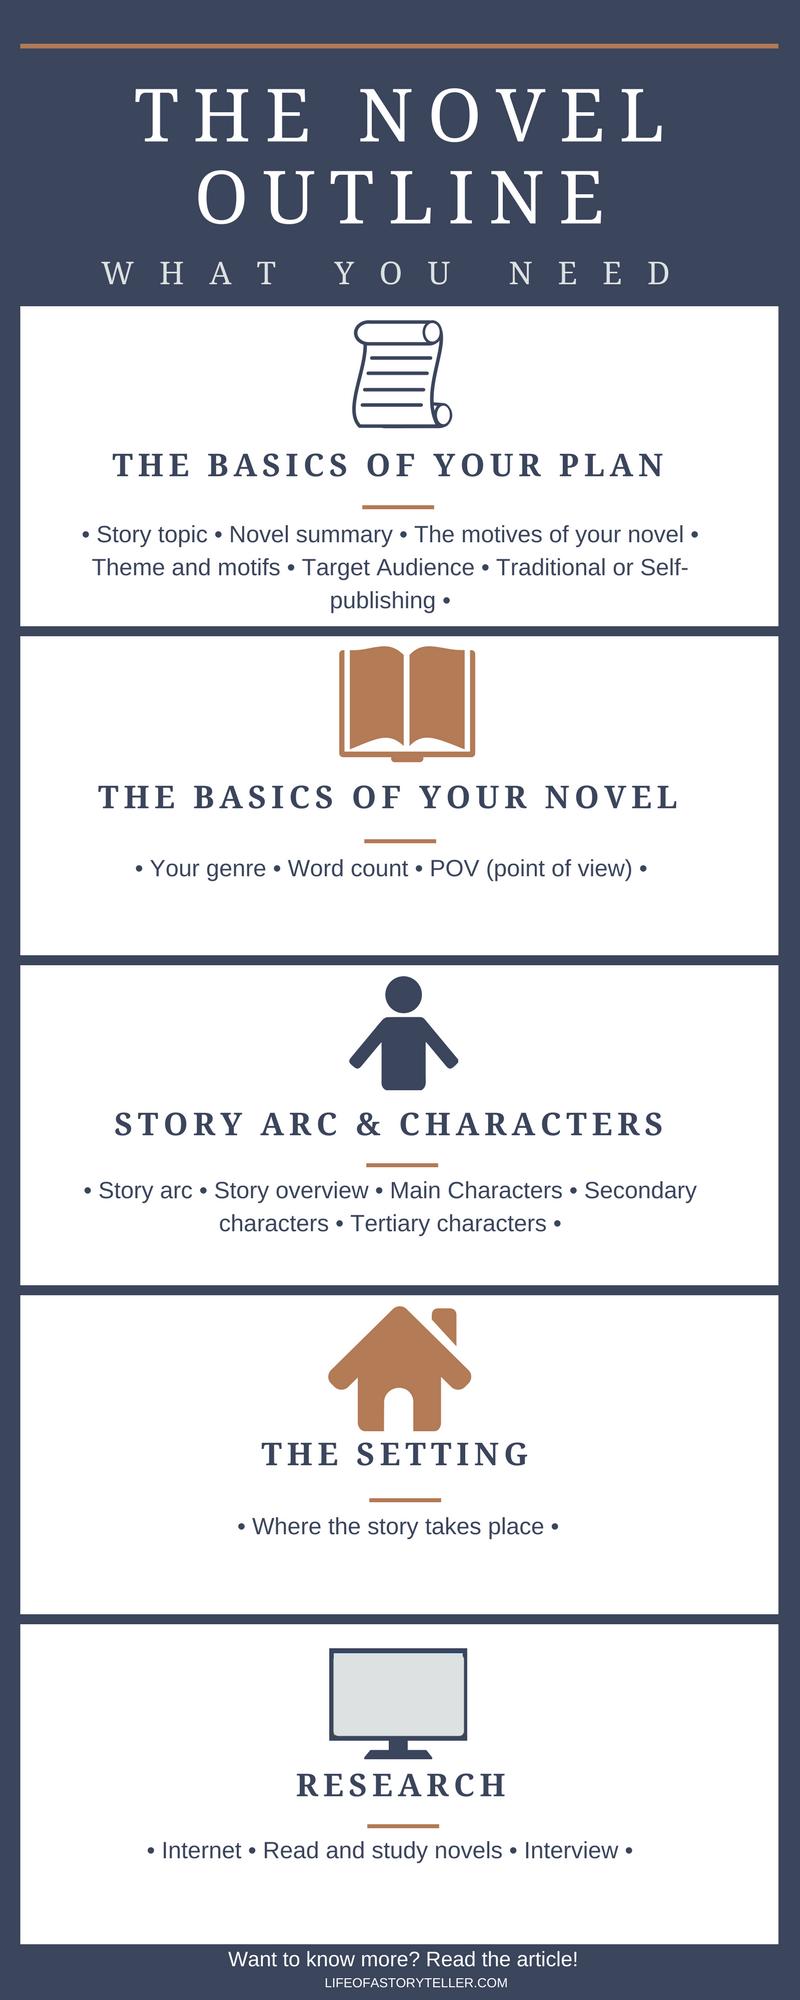 HOW TO WRITE A NOVEL OUTLINE  Writing tips, Writing a book